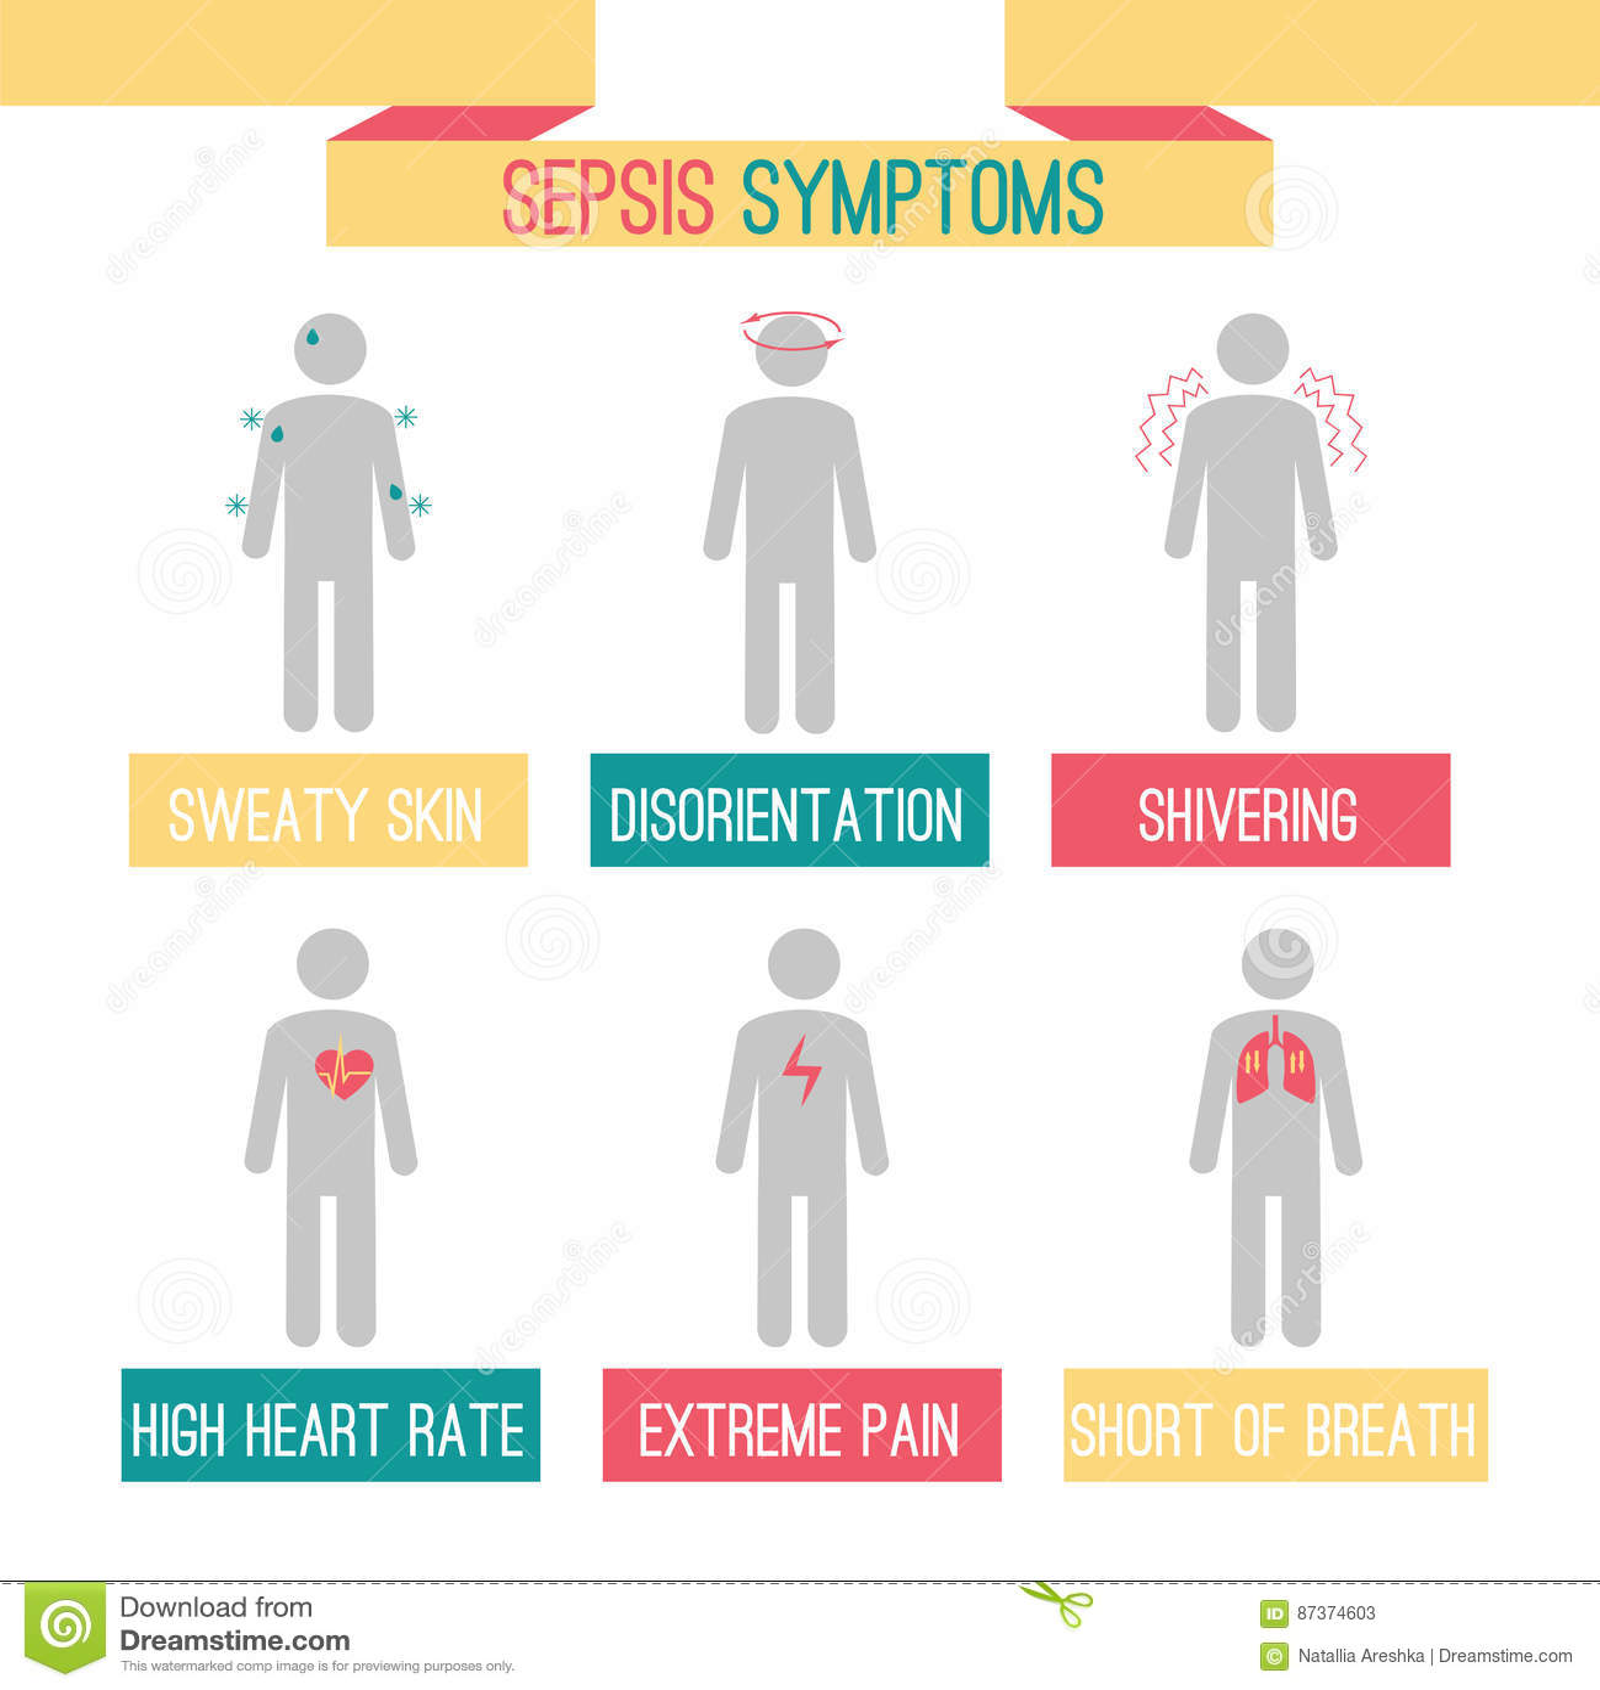 photo E. Coli Symptoms